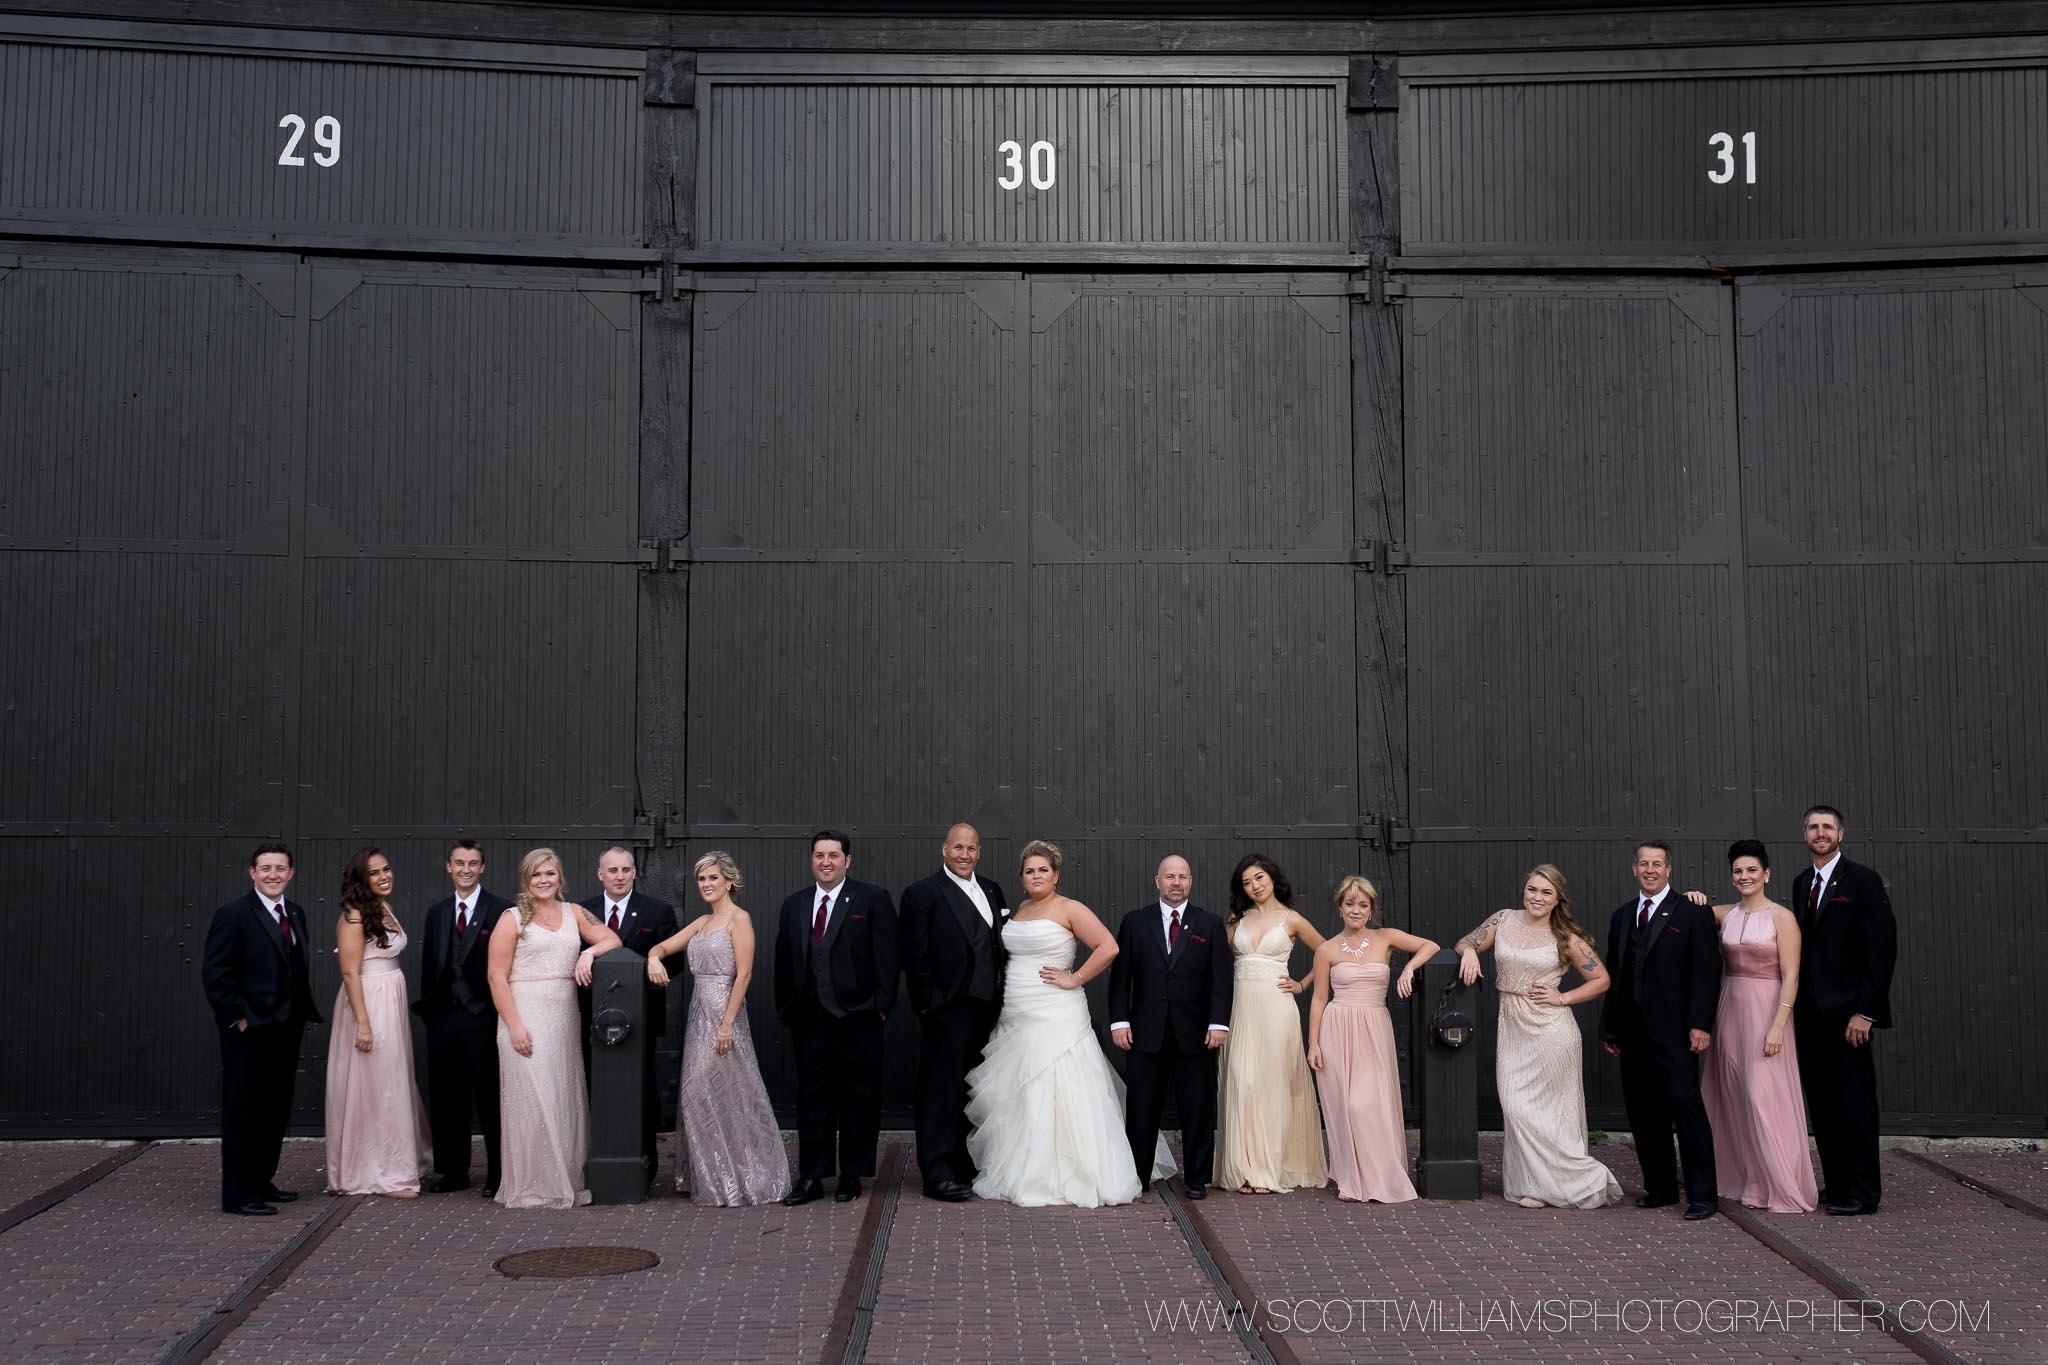 steamwhistle-toronto-wedding-001.jpg